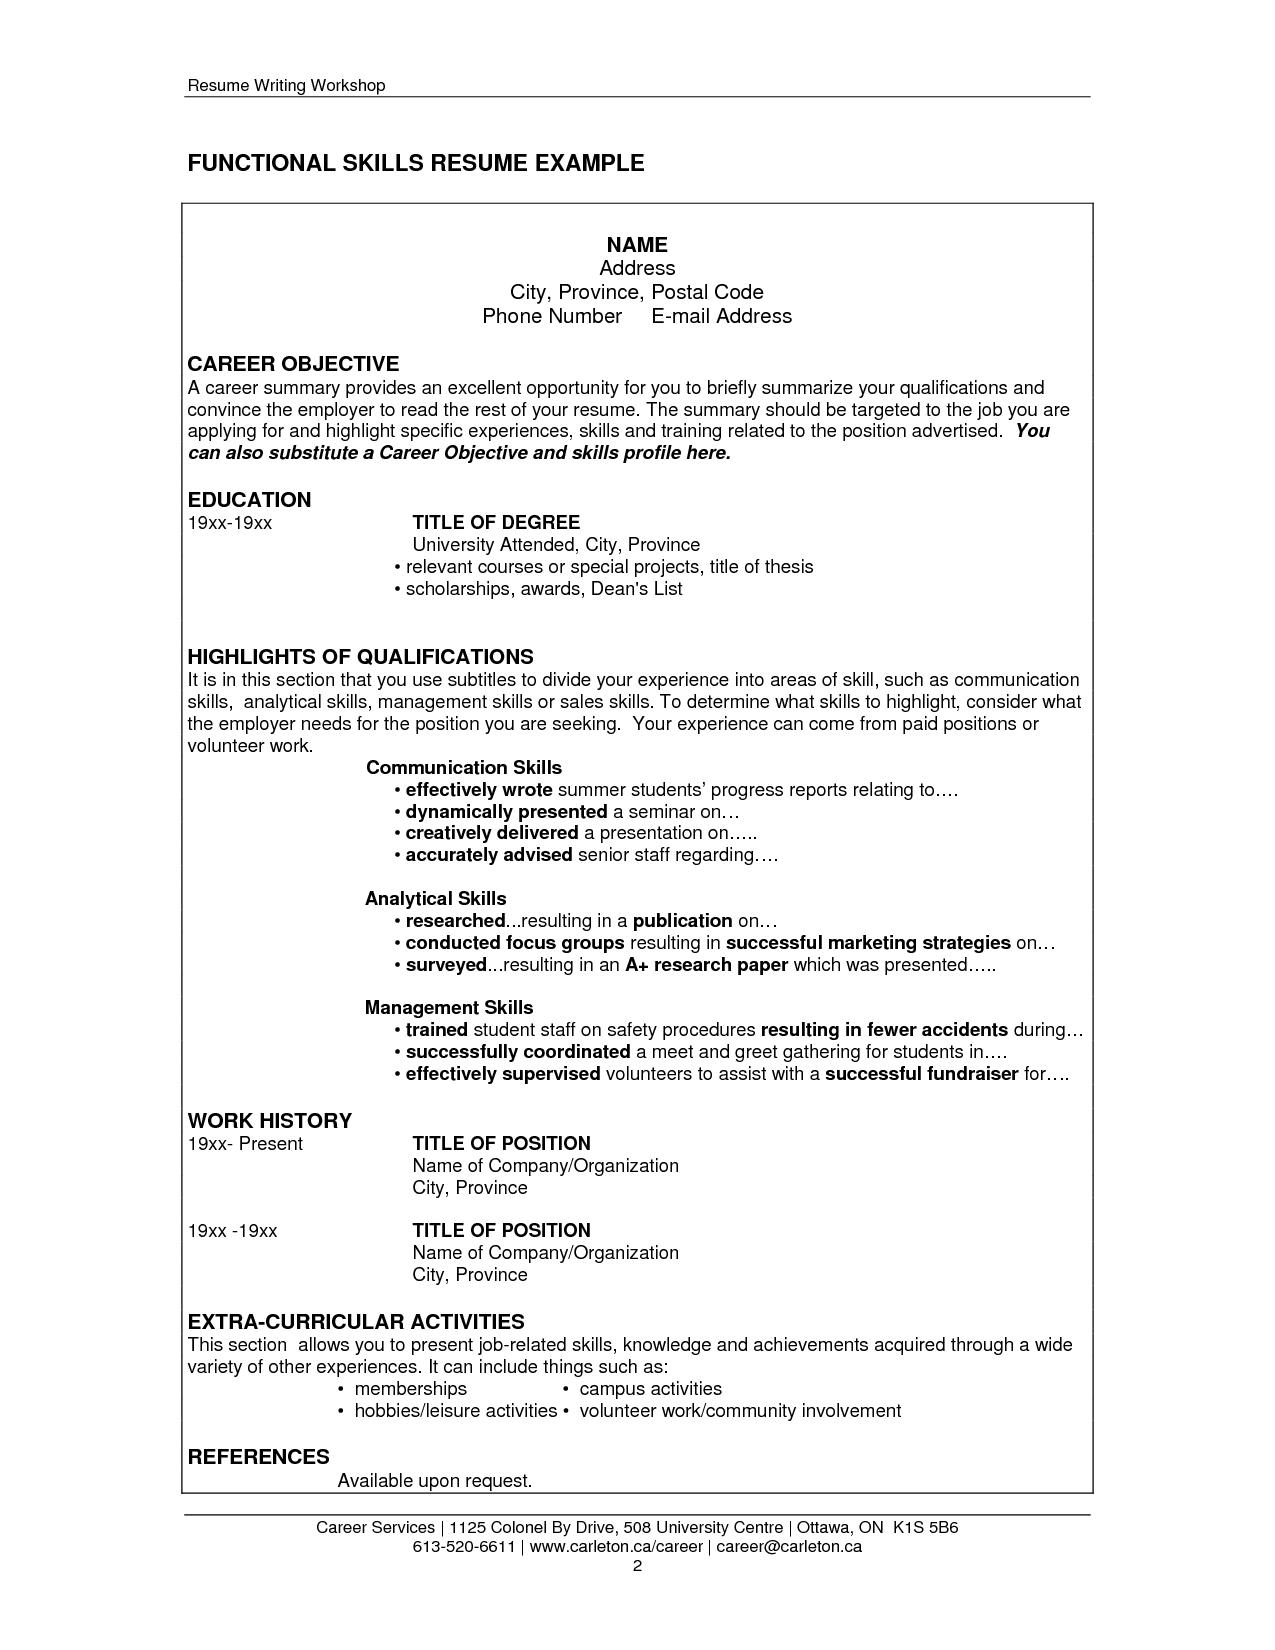 27 Example Of Skills On Resume Sample Resumes Resume Skills Resume Skills Section Good Resume Examples